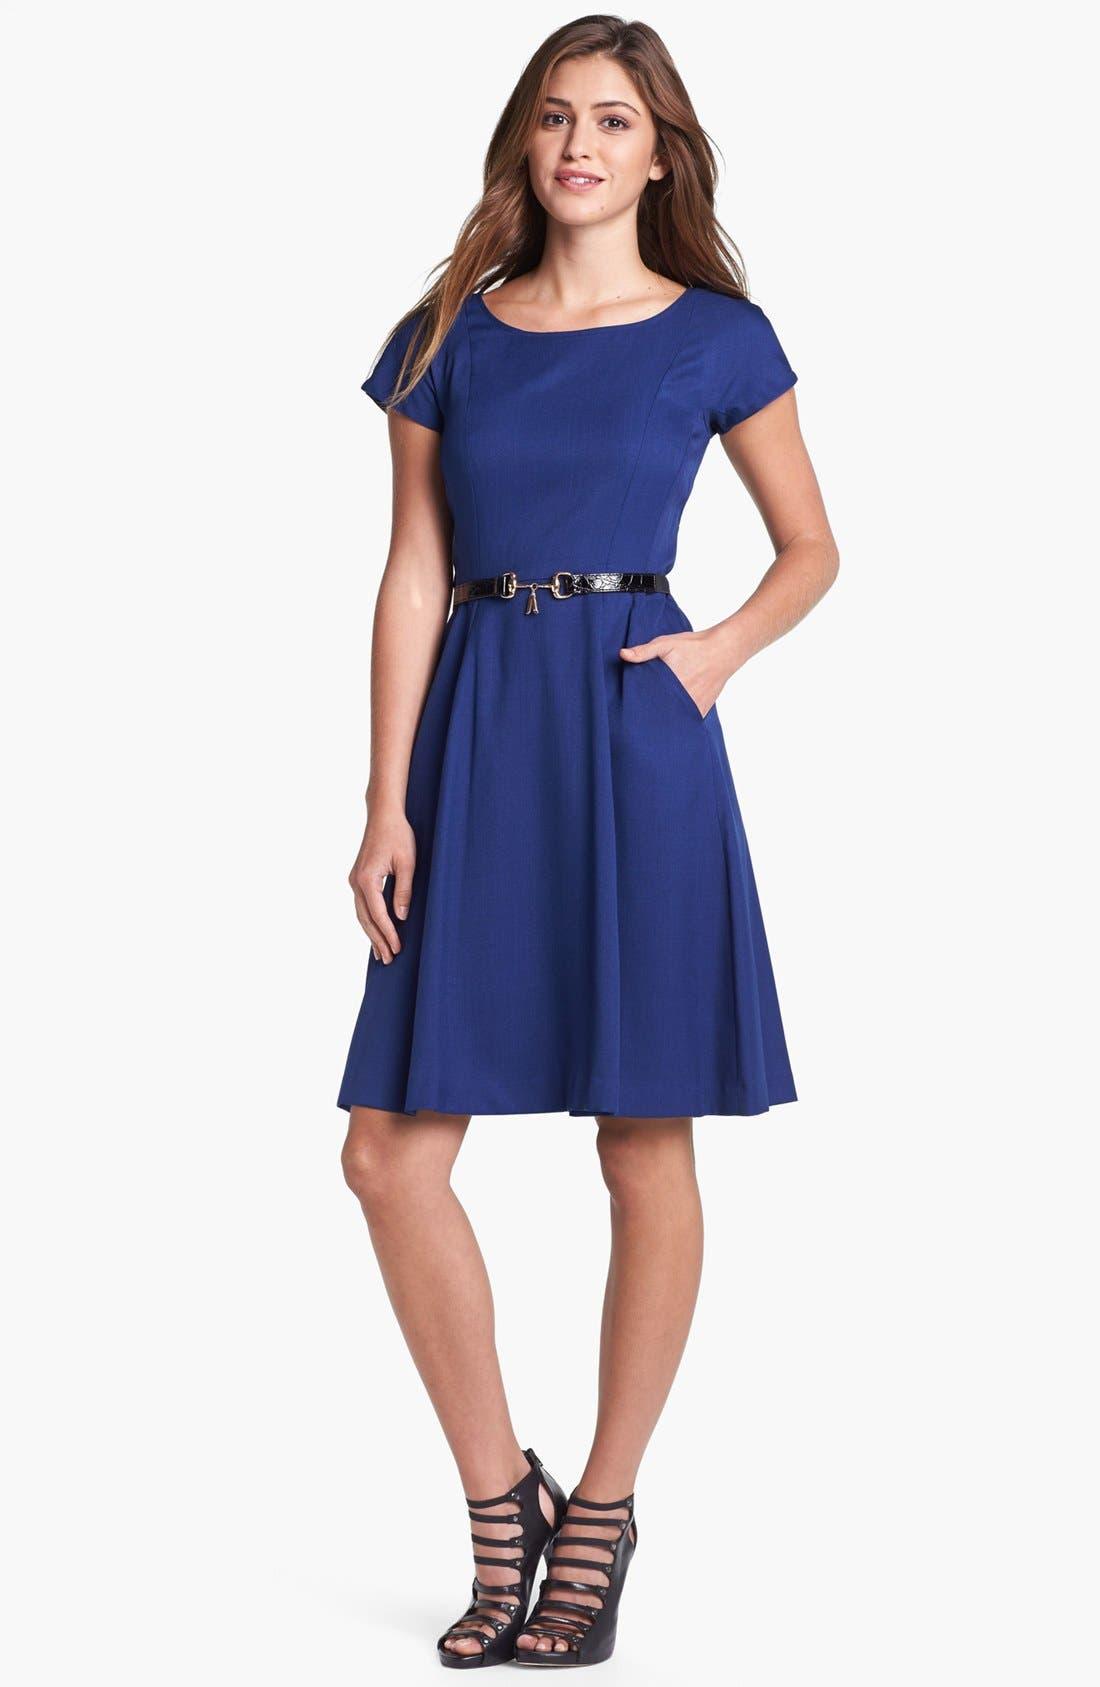 Alternate Image 1 Selected - Ellen Tracy Cap Sleeve Fit & Flare Dress